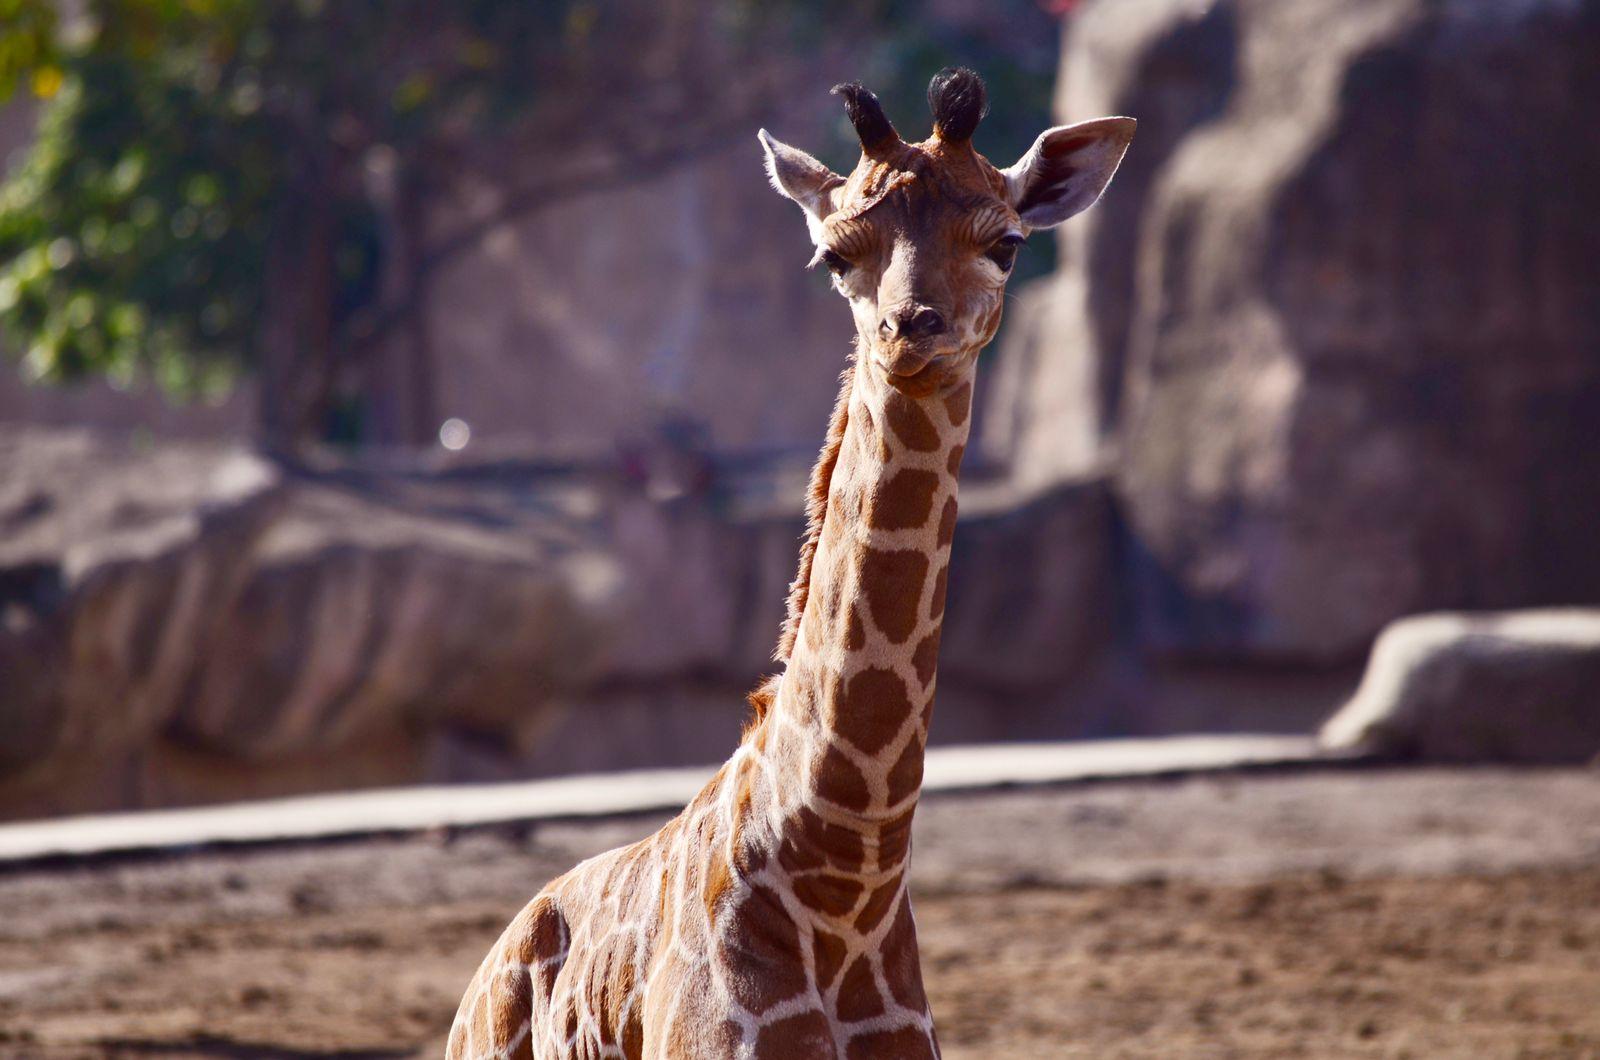 Nace jirafa en zoológico de San Juan de Aragón